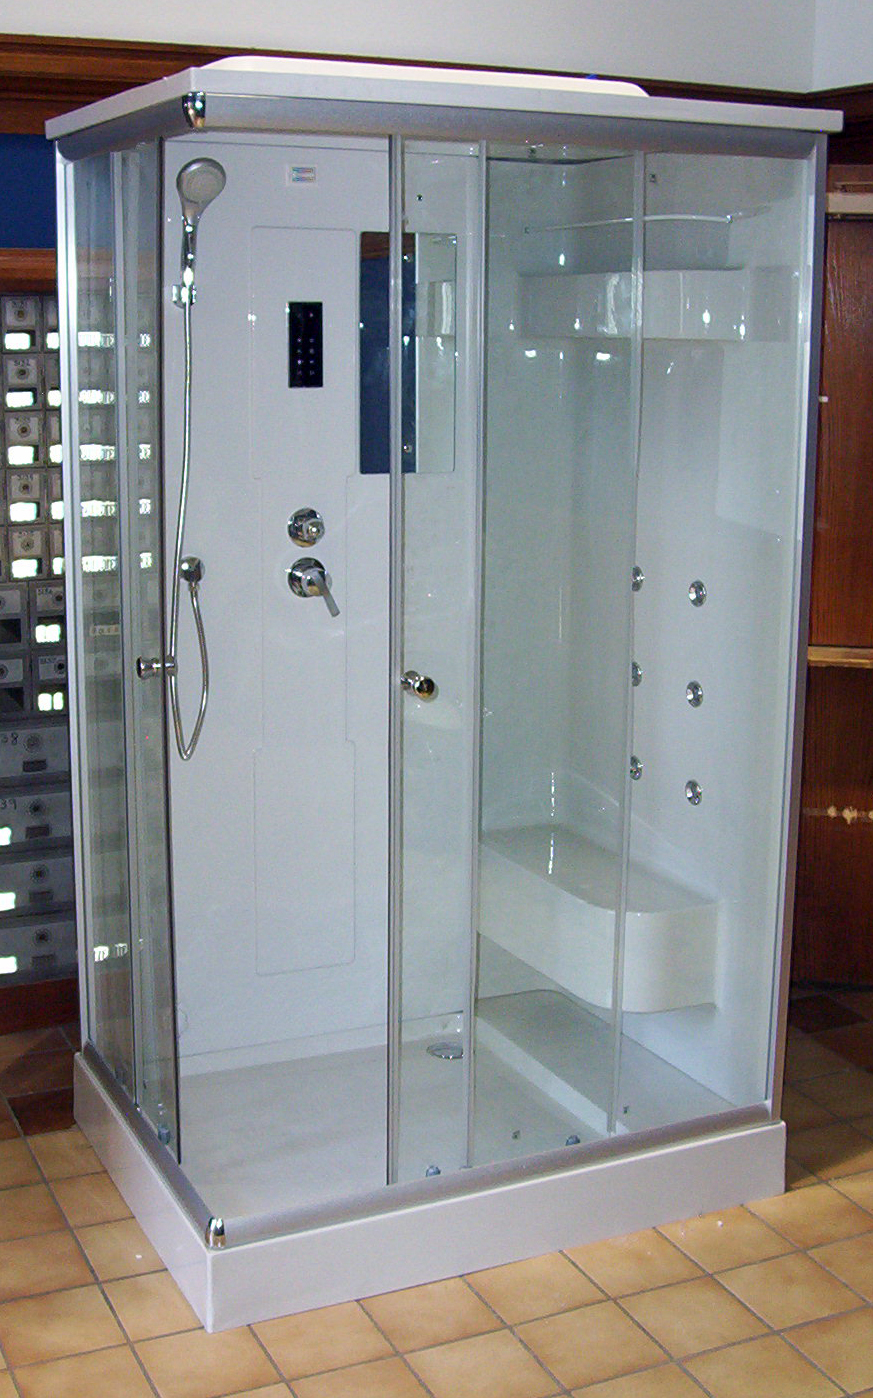 Luxury Spas And Whirlpool Bathtubs OW Q59 STEAM SHOWER